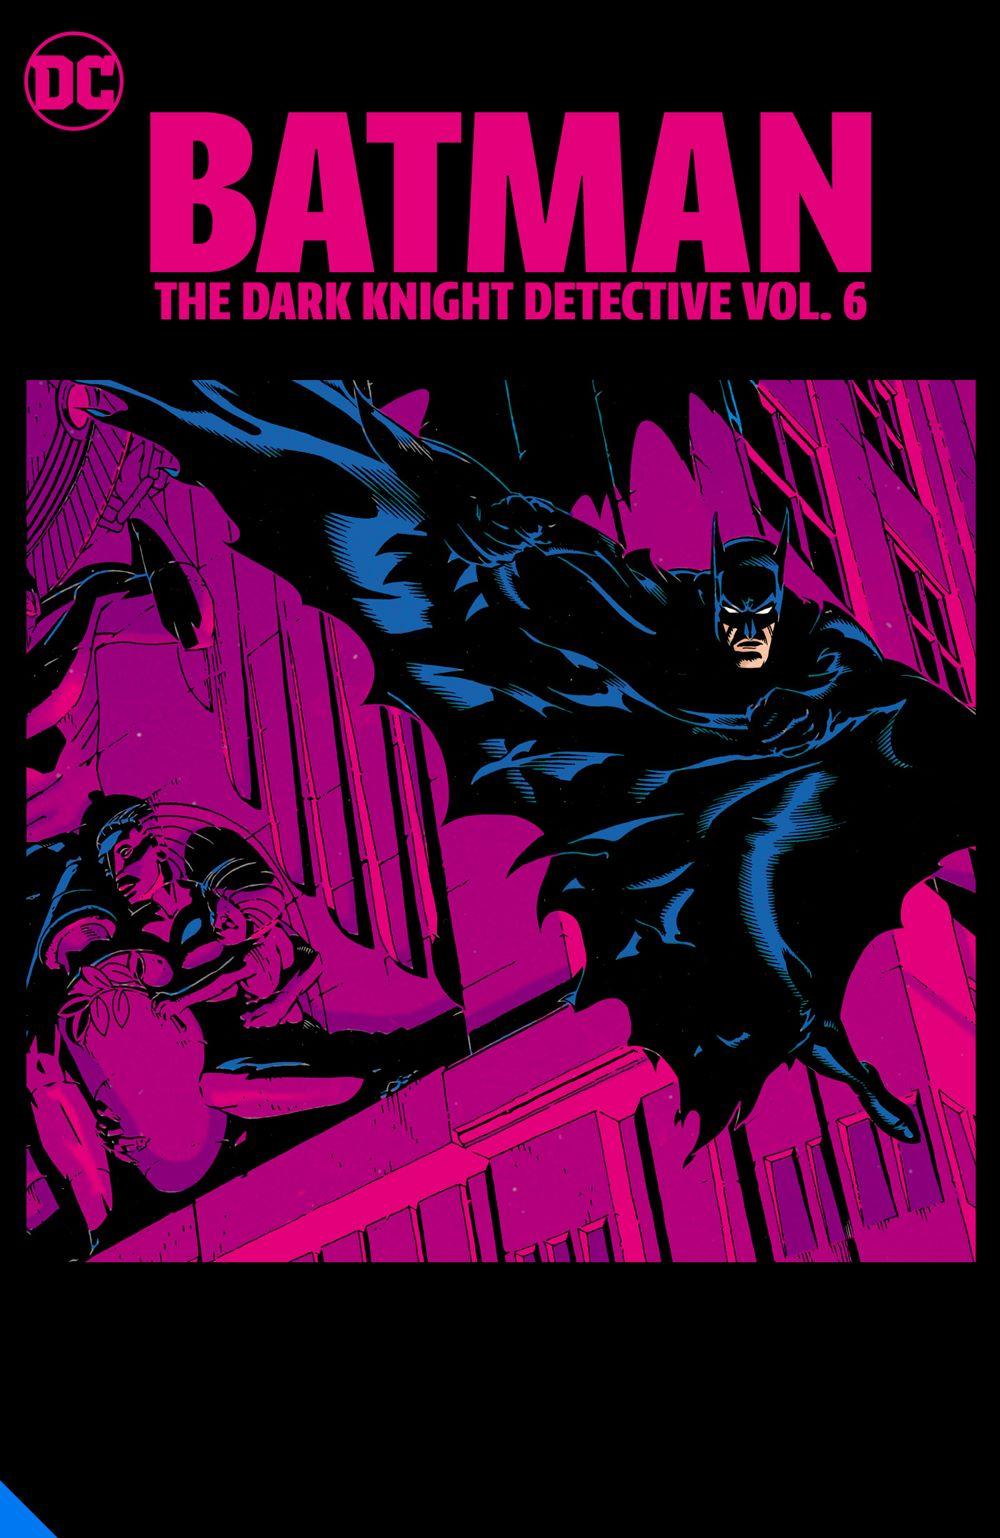 batmanthedarkknightdetective-vol6_adv DC Comics August 2021 Solicitations